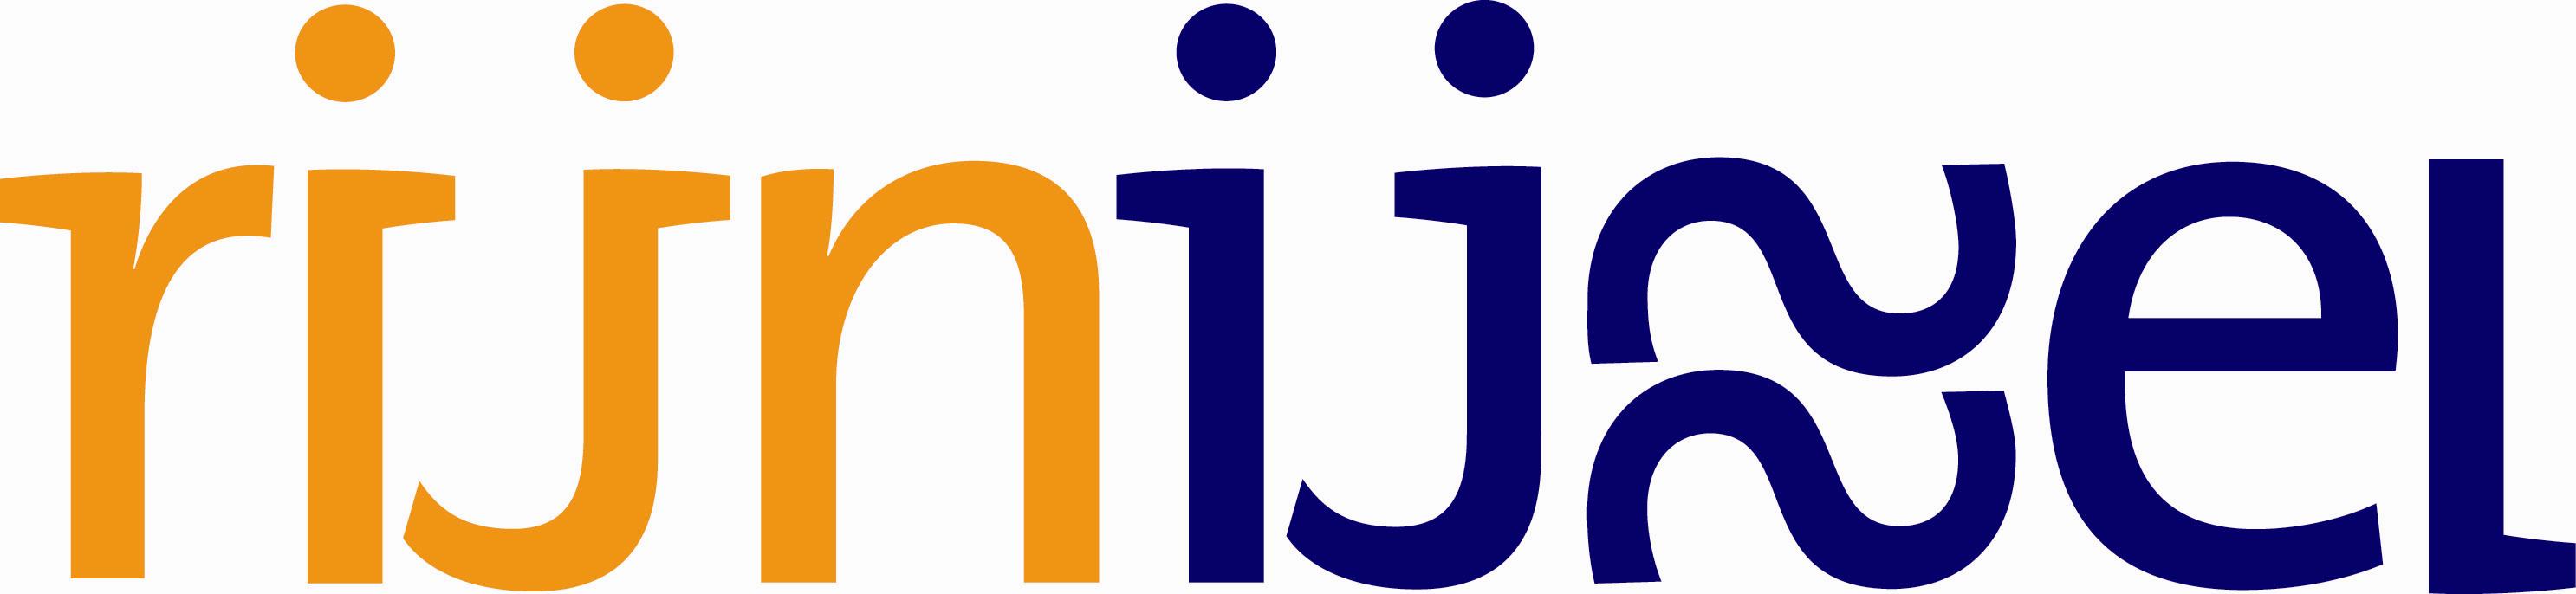 roc-rijn-ijssel-logo-